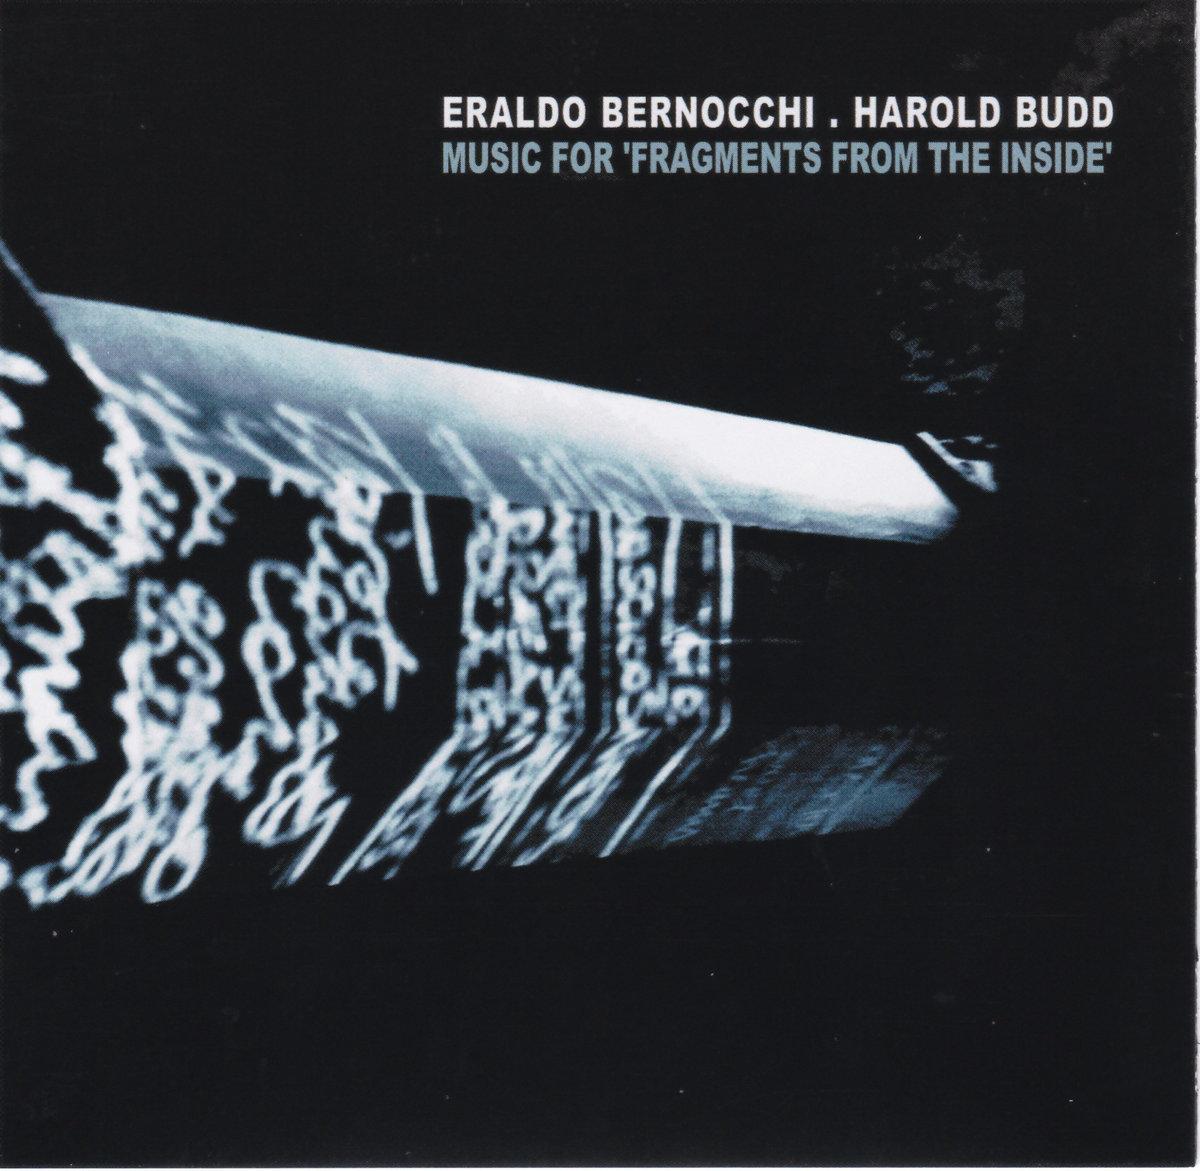 Music for Fragments from the Inside | Harold Budd + Eraldo Bernocchi | Sub  Rosa Label